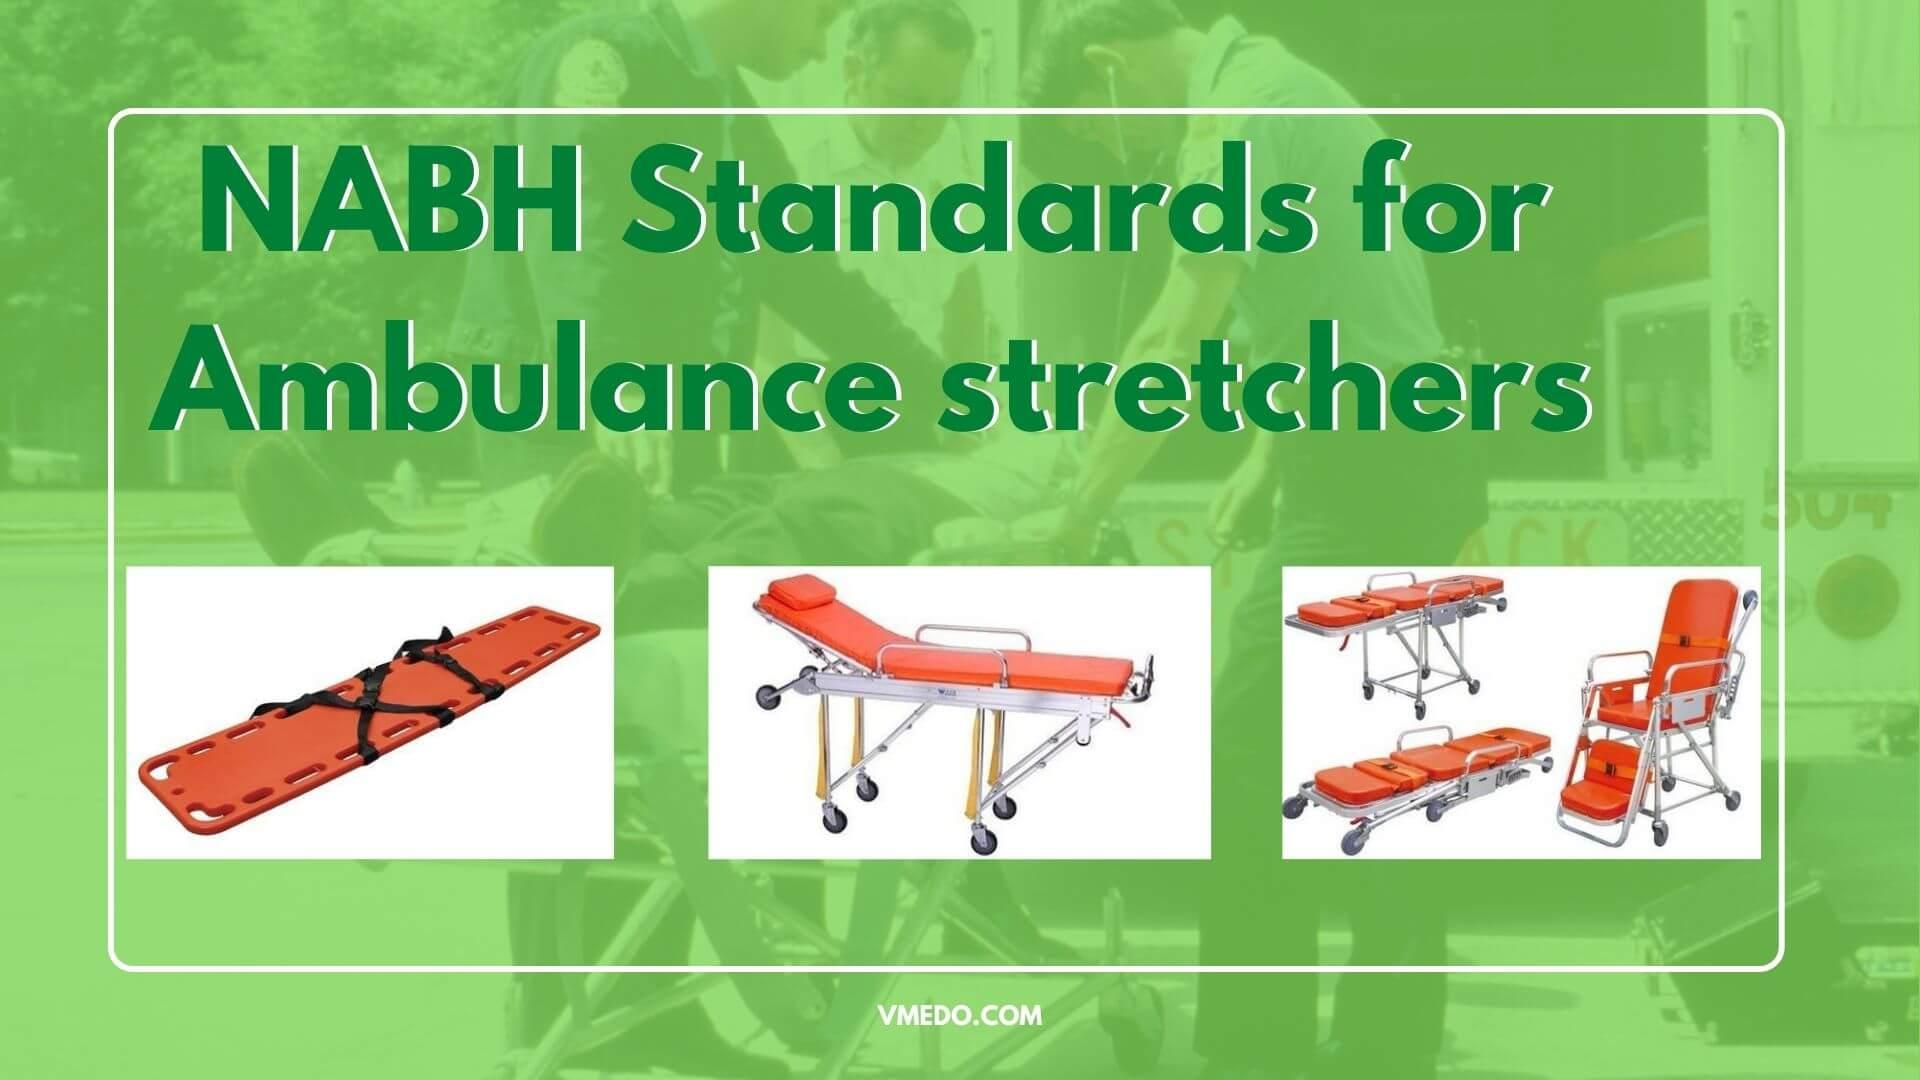 NABH Standards for ambulance stretcher